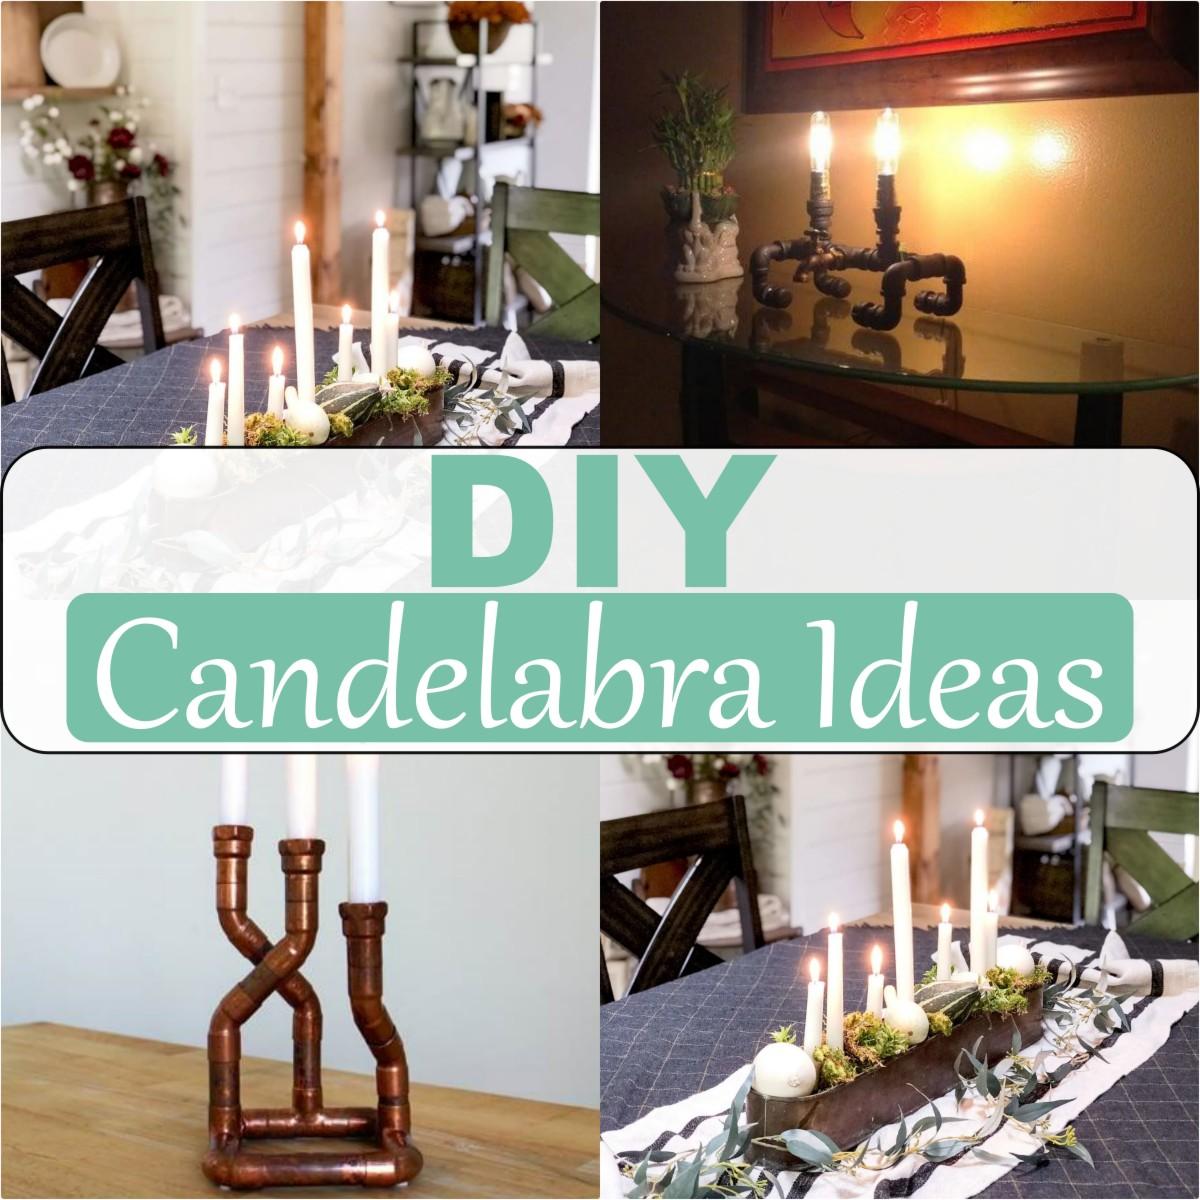 DIY Candelabra Ideas